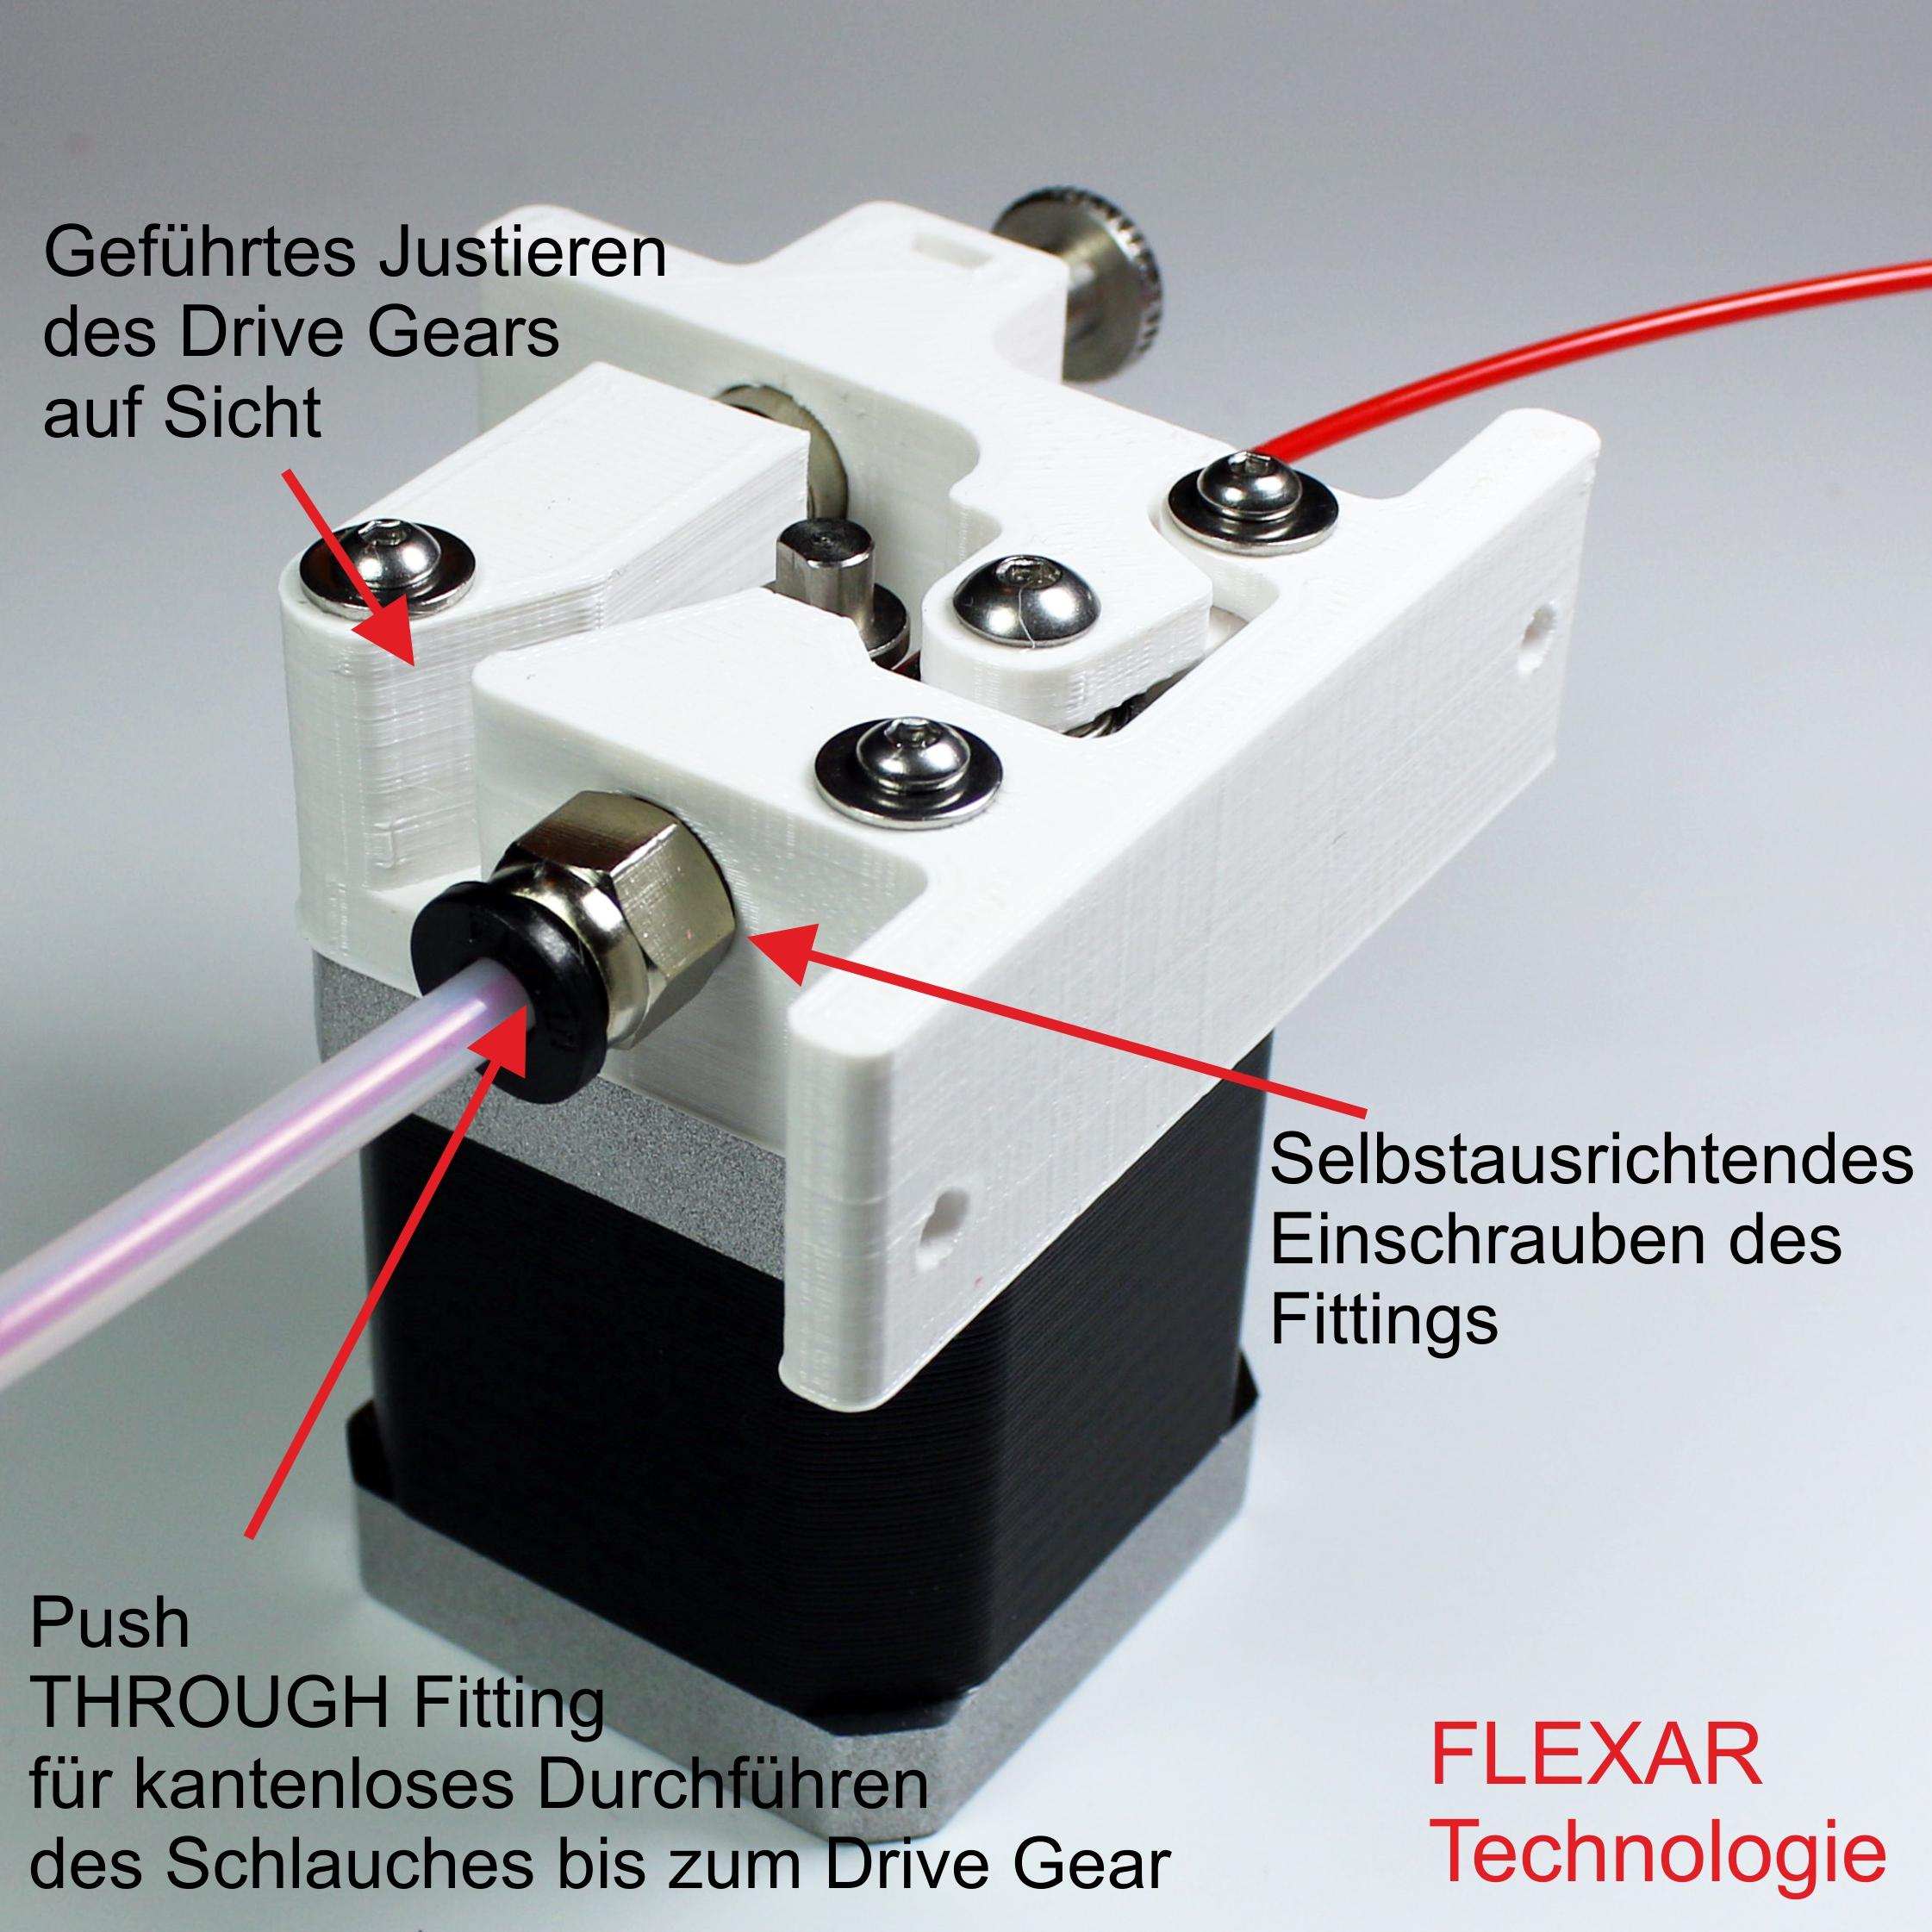 flexar-extruder-eigenschaften-beschrieben-3